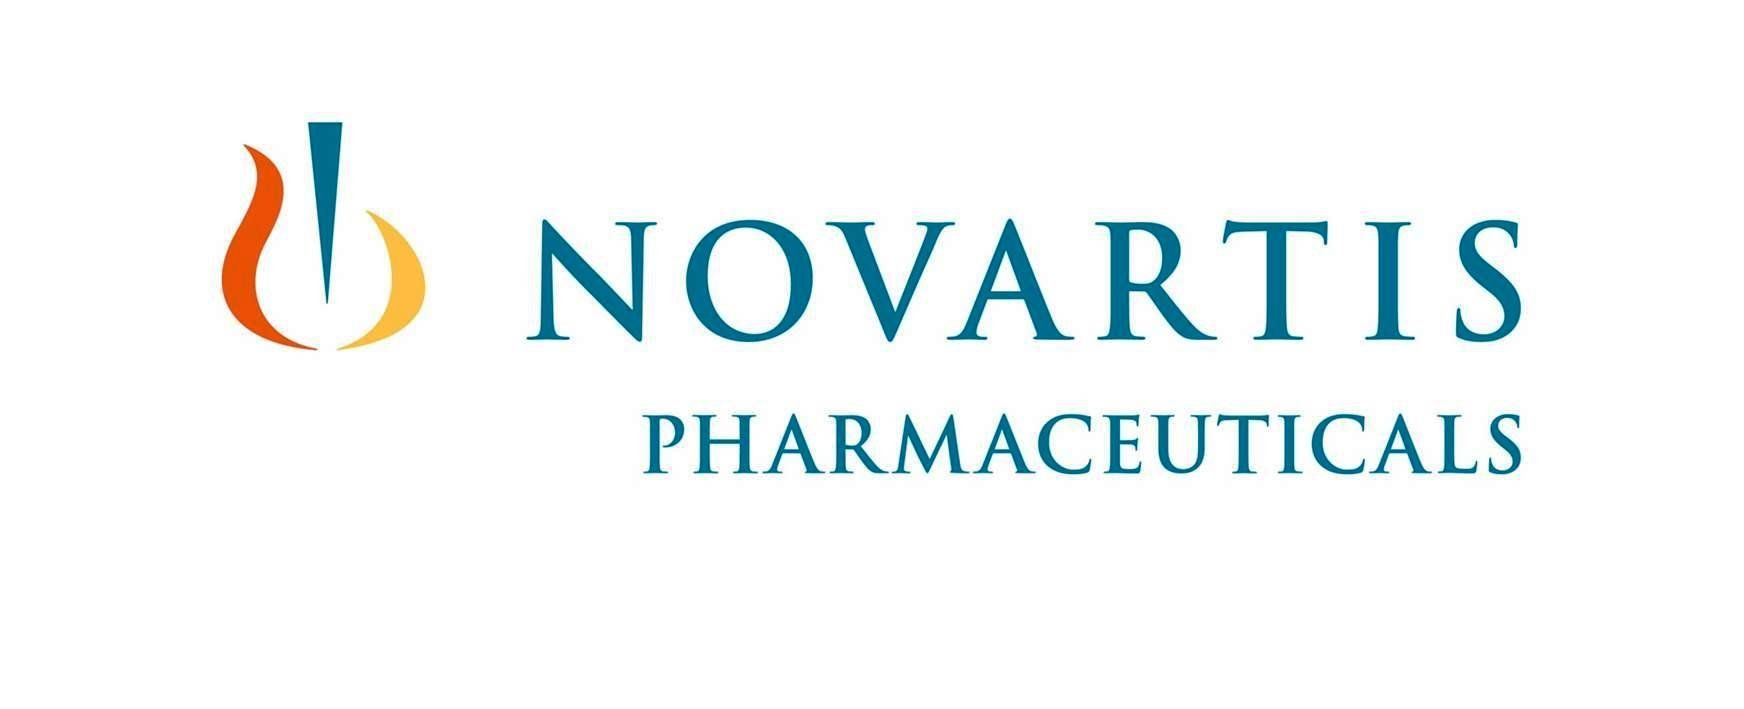 Novartis-LOGO-WITH-CORRECT-WHITE-SPACE-large-1920w